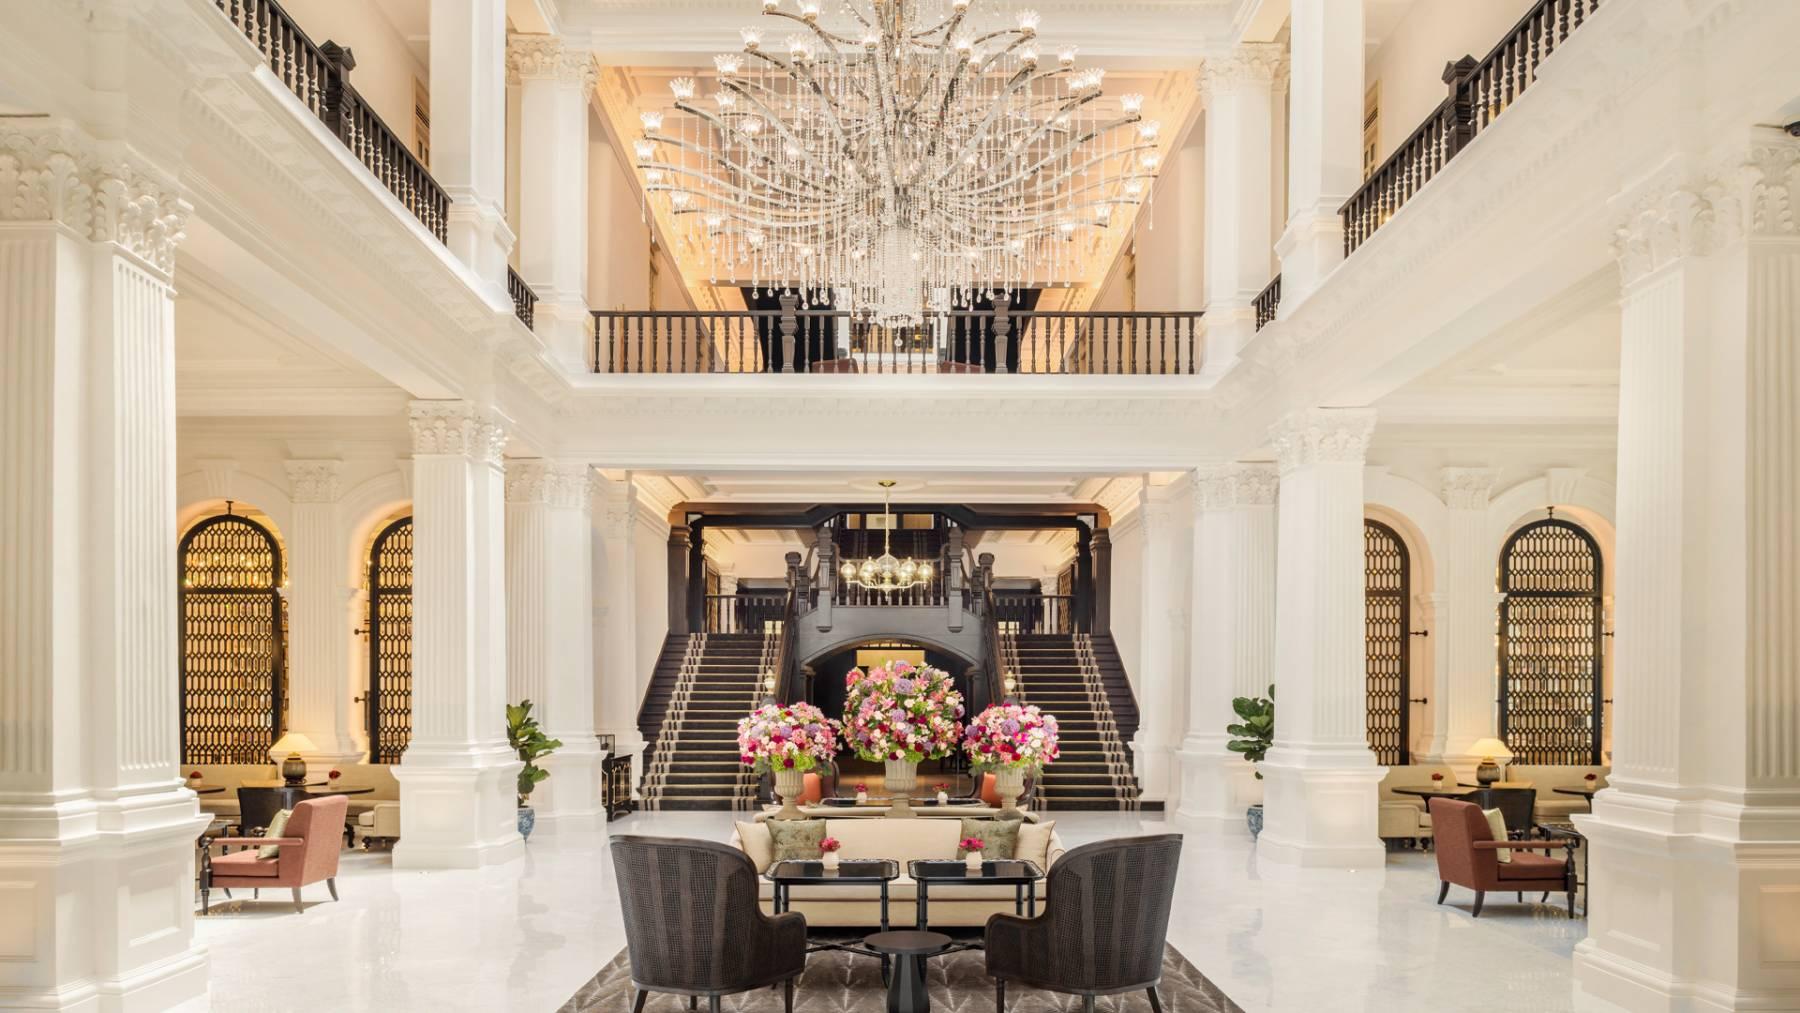 Raffles Singapore - The Grand Lobby